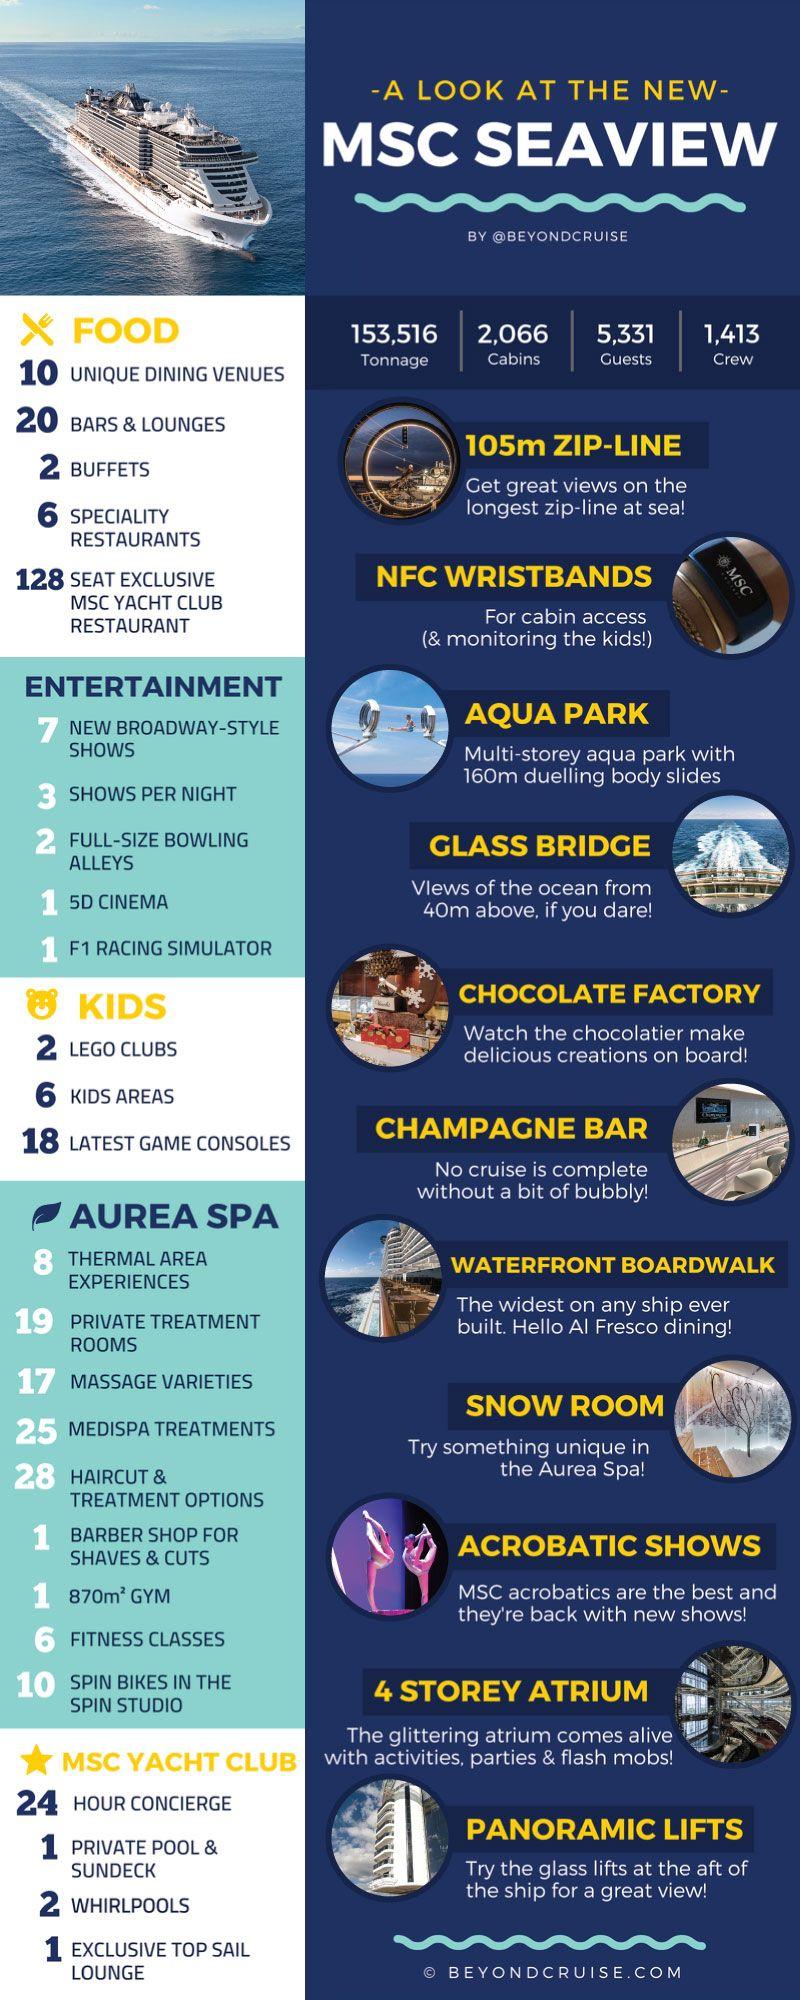 MSC Seaview Top 15 Things To Do | Msc cruises, Honeymoon ...